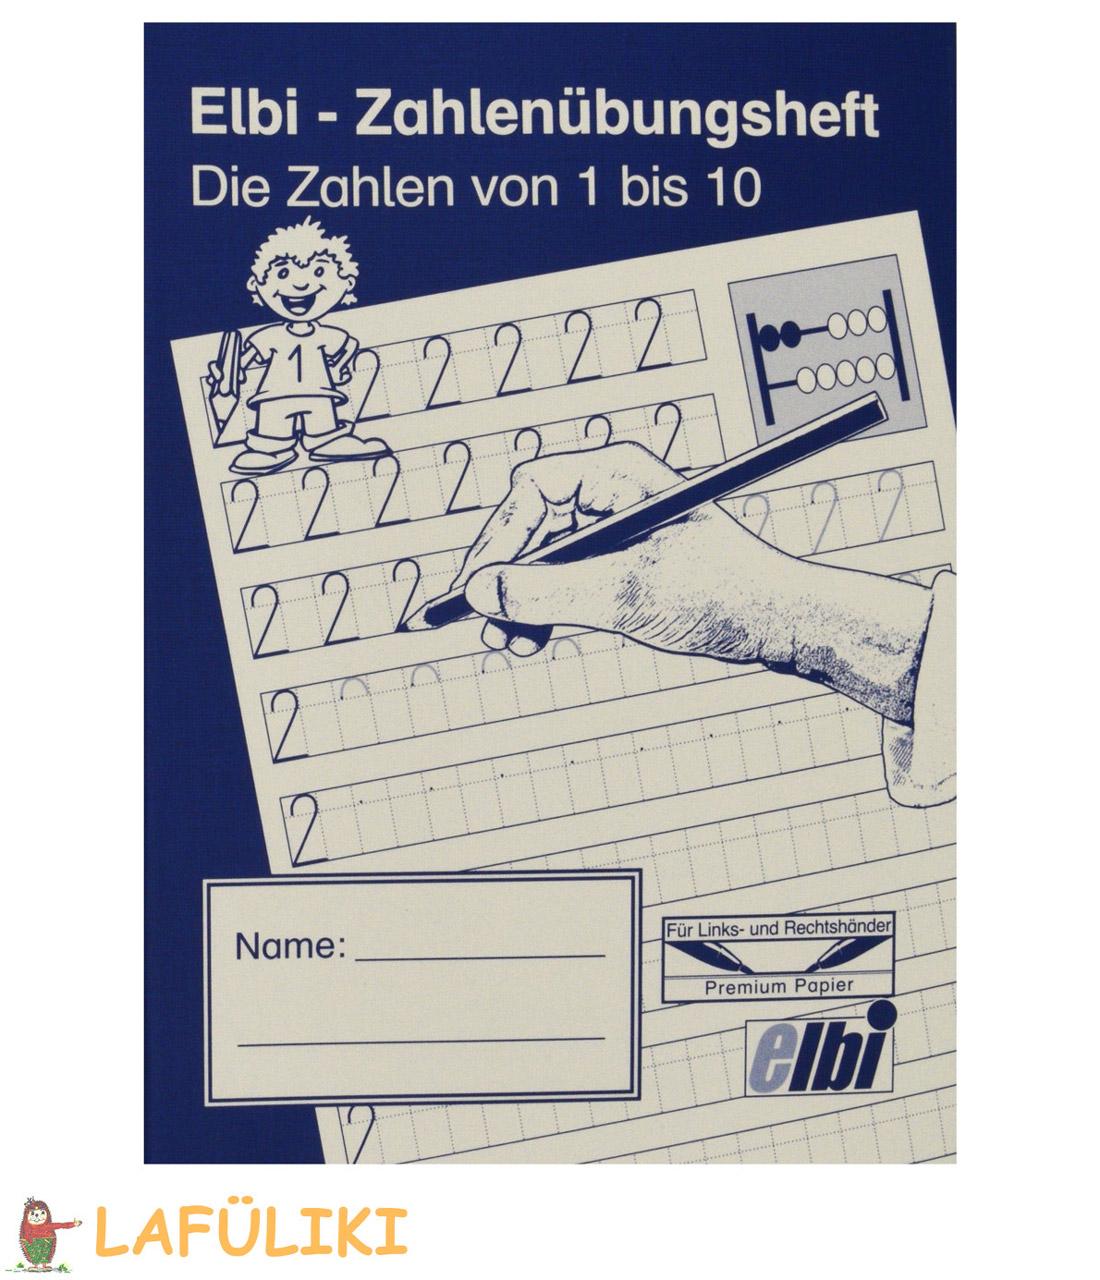 Elbi-Zahlenuebungsheft-1-10-Lafueliki